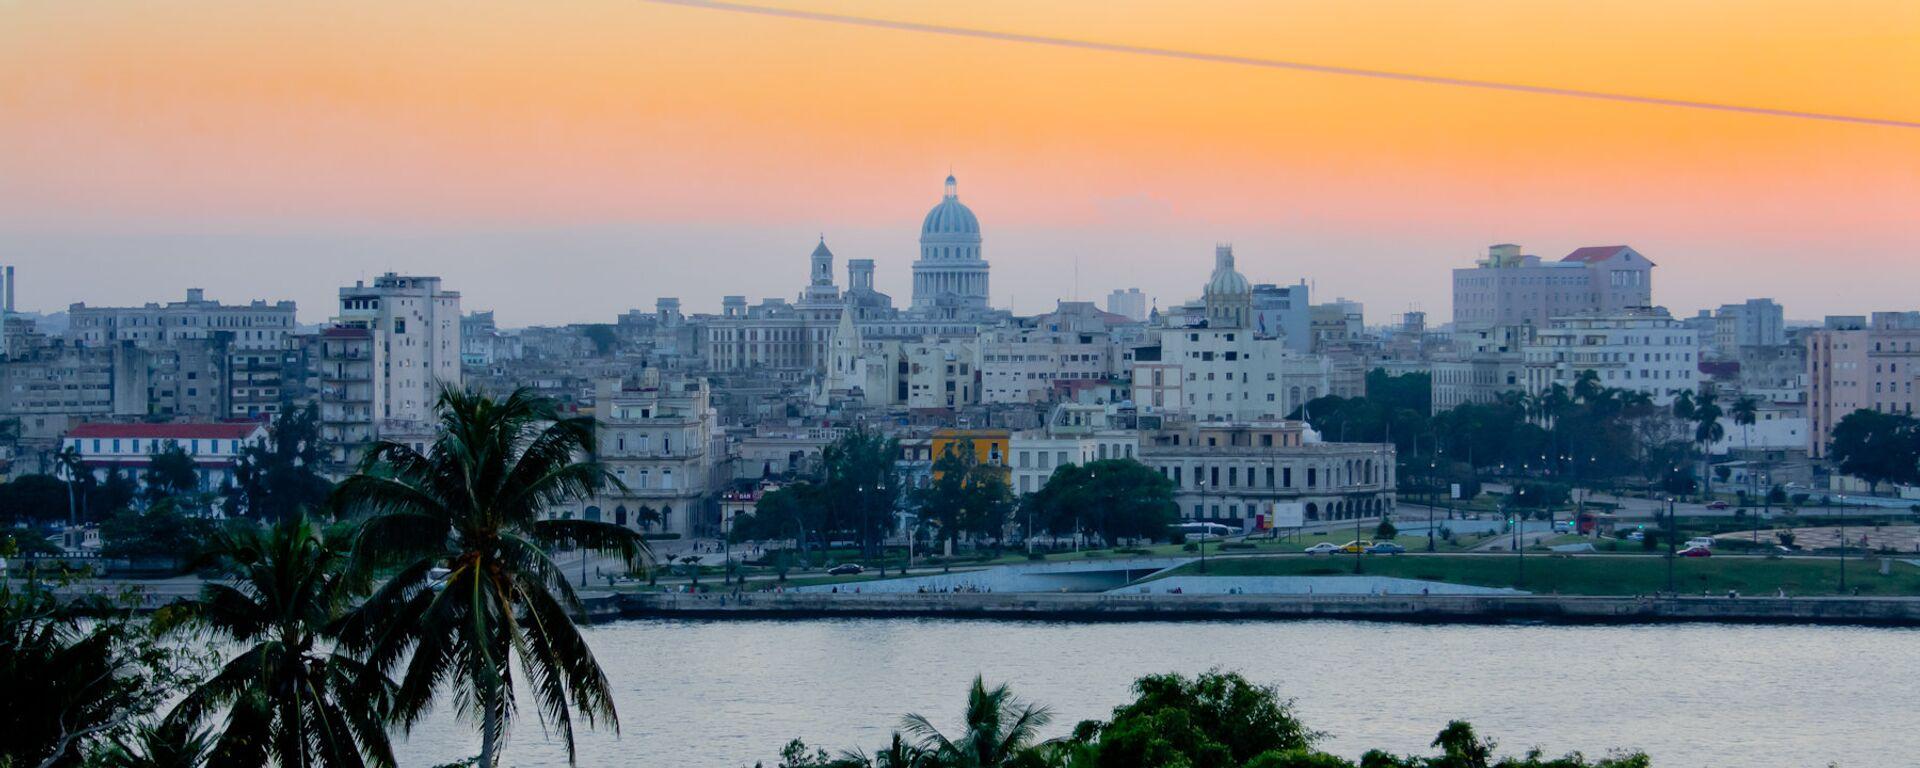 Atardecer en La Habana - Sputnik Mundo, 1920, 09.09.2021